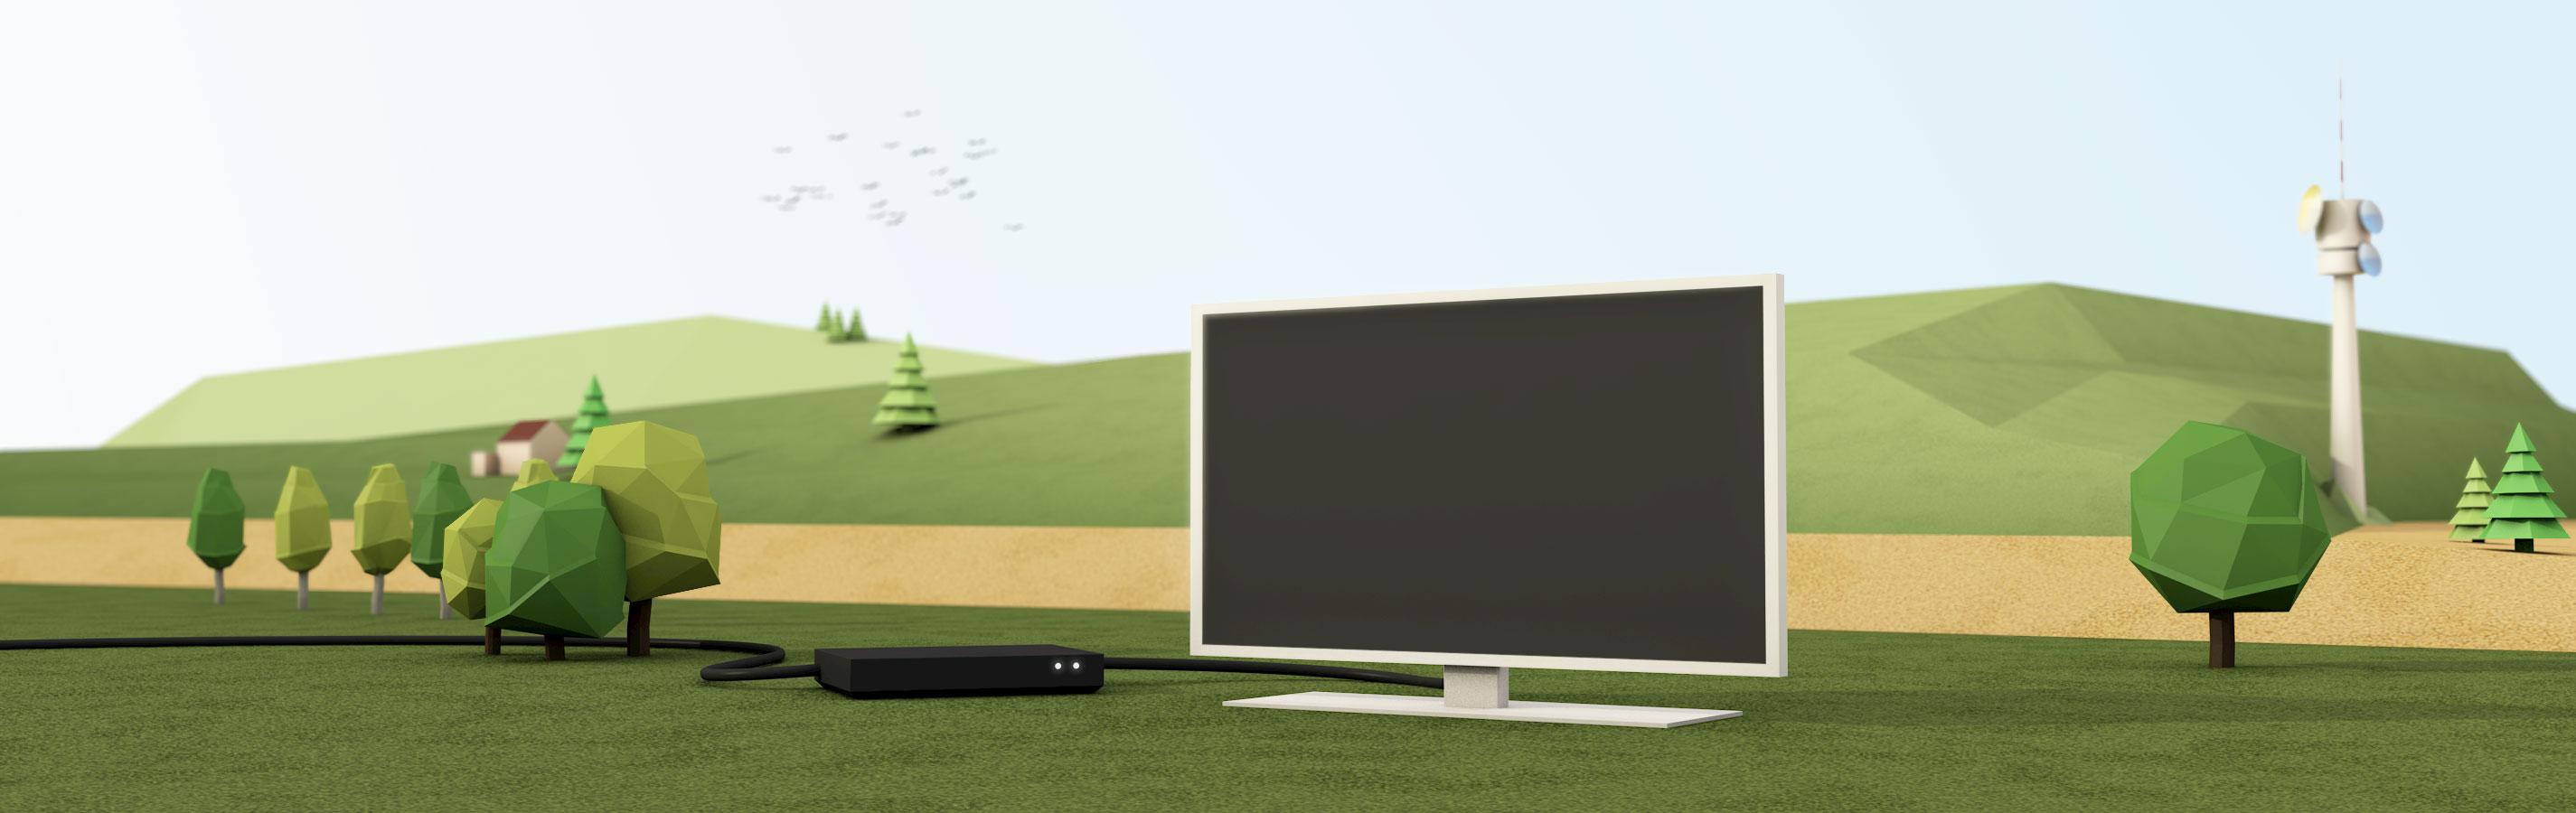 Digital-IPTV-Box